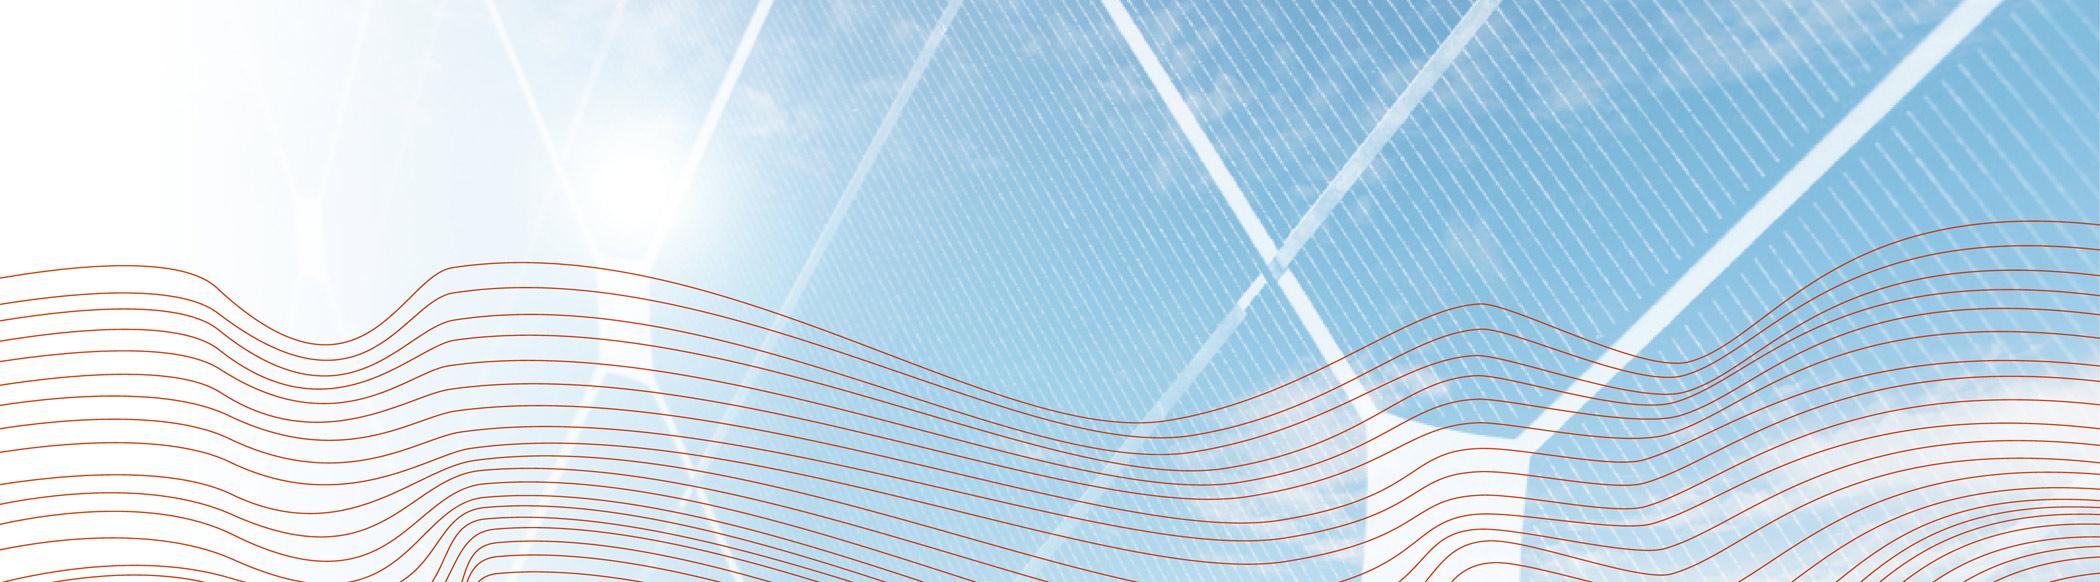 Muri Energie Forum – Sonnenenergie